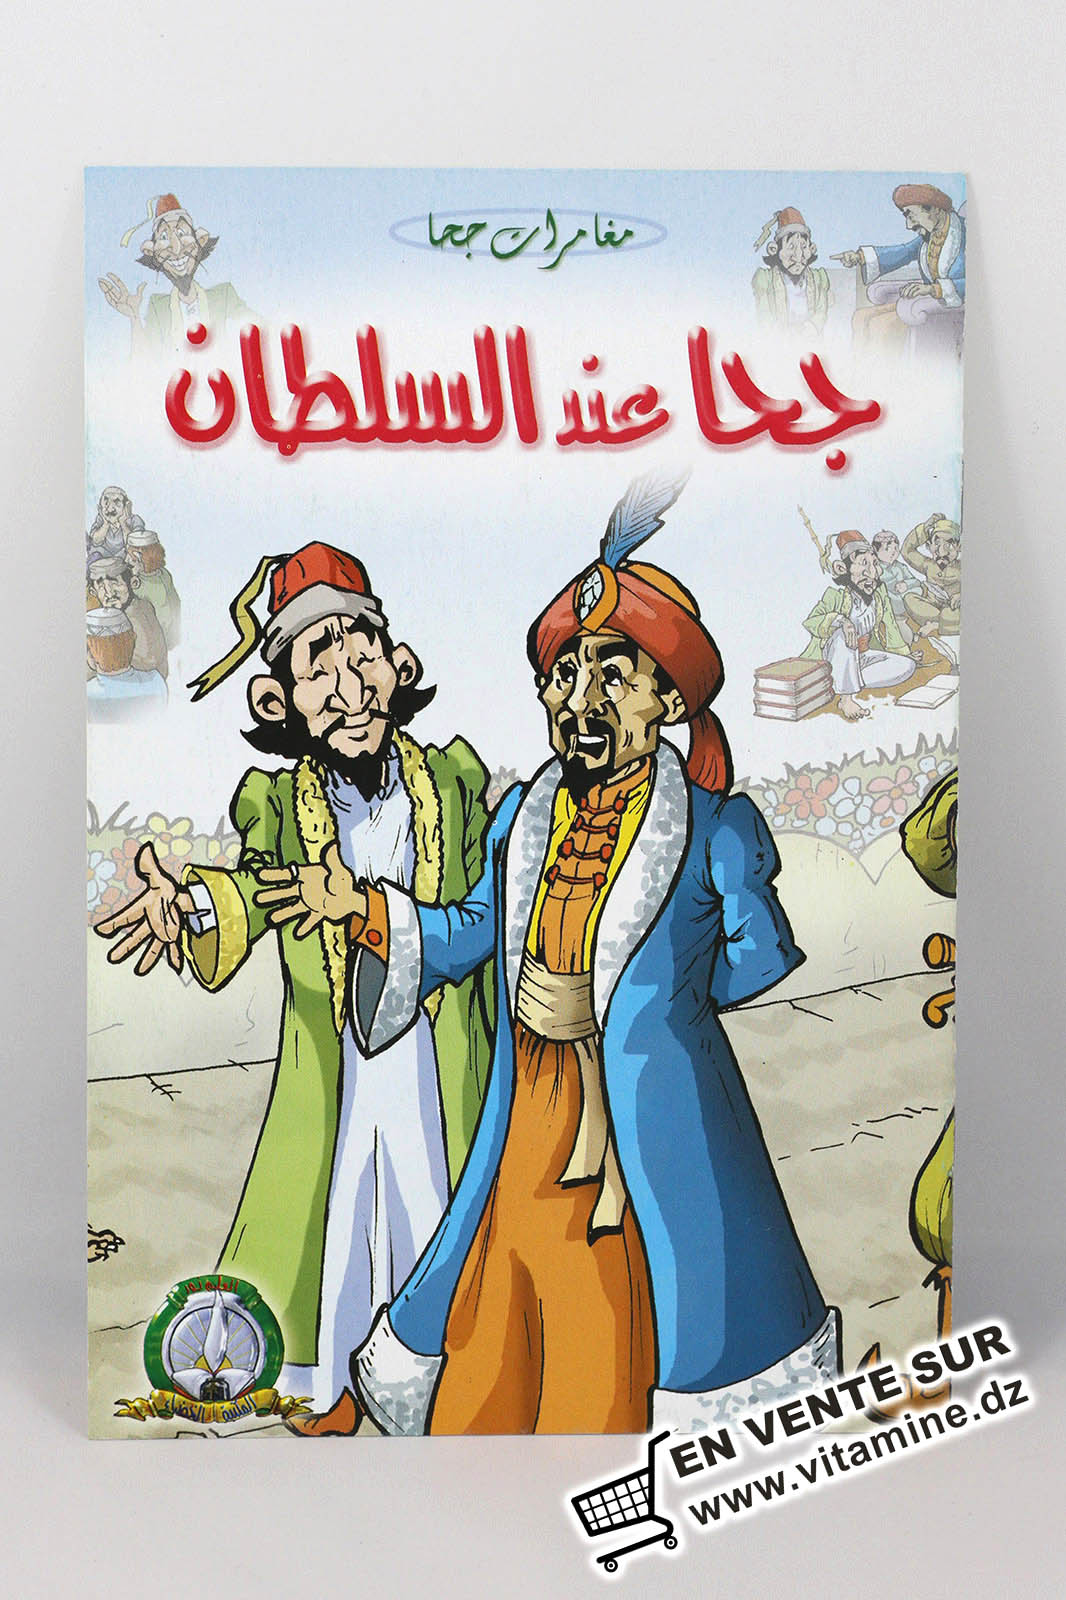 Les aventures de Djeha - Djeha et le roi